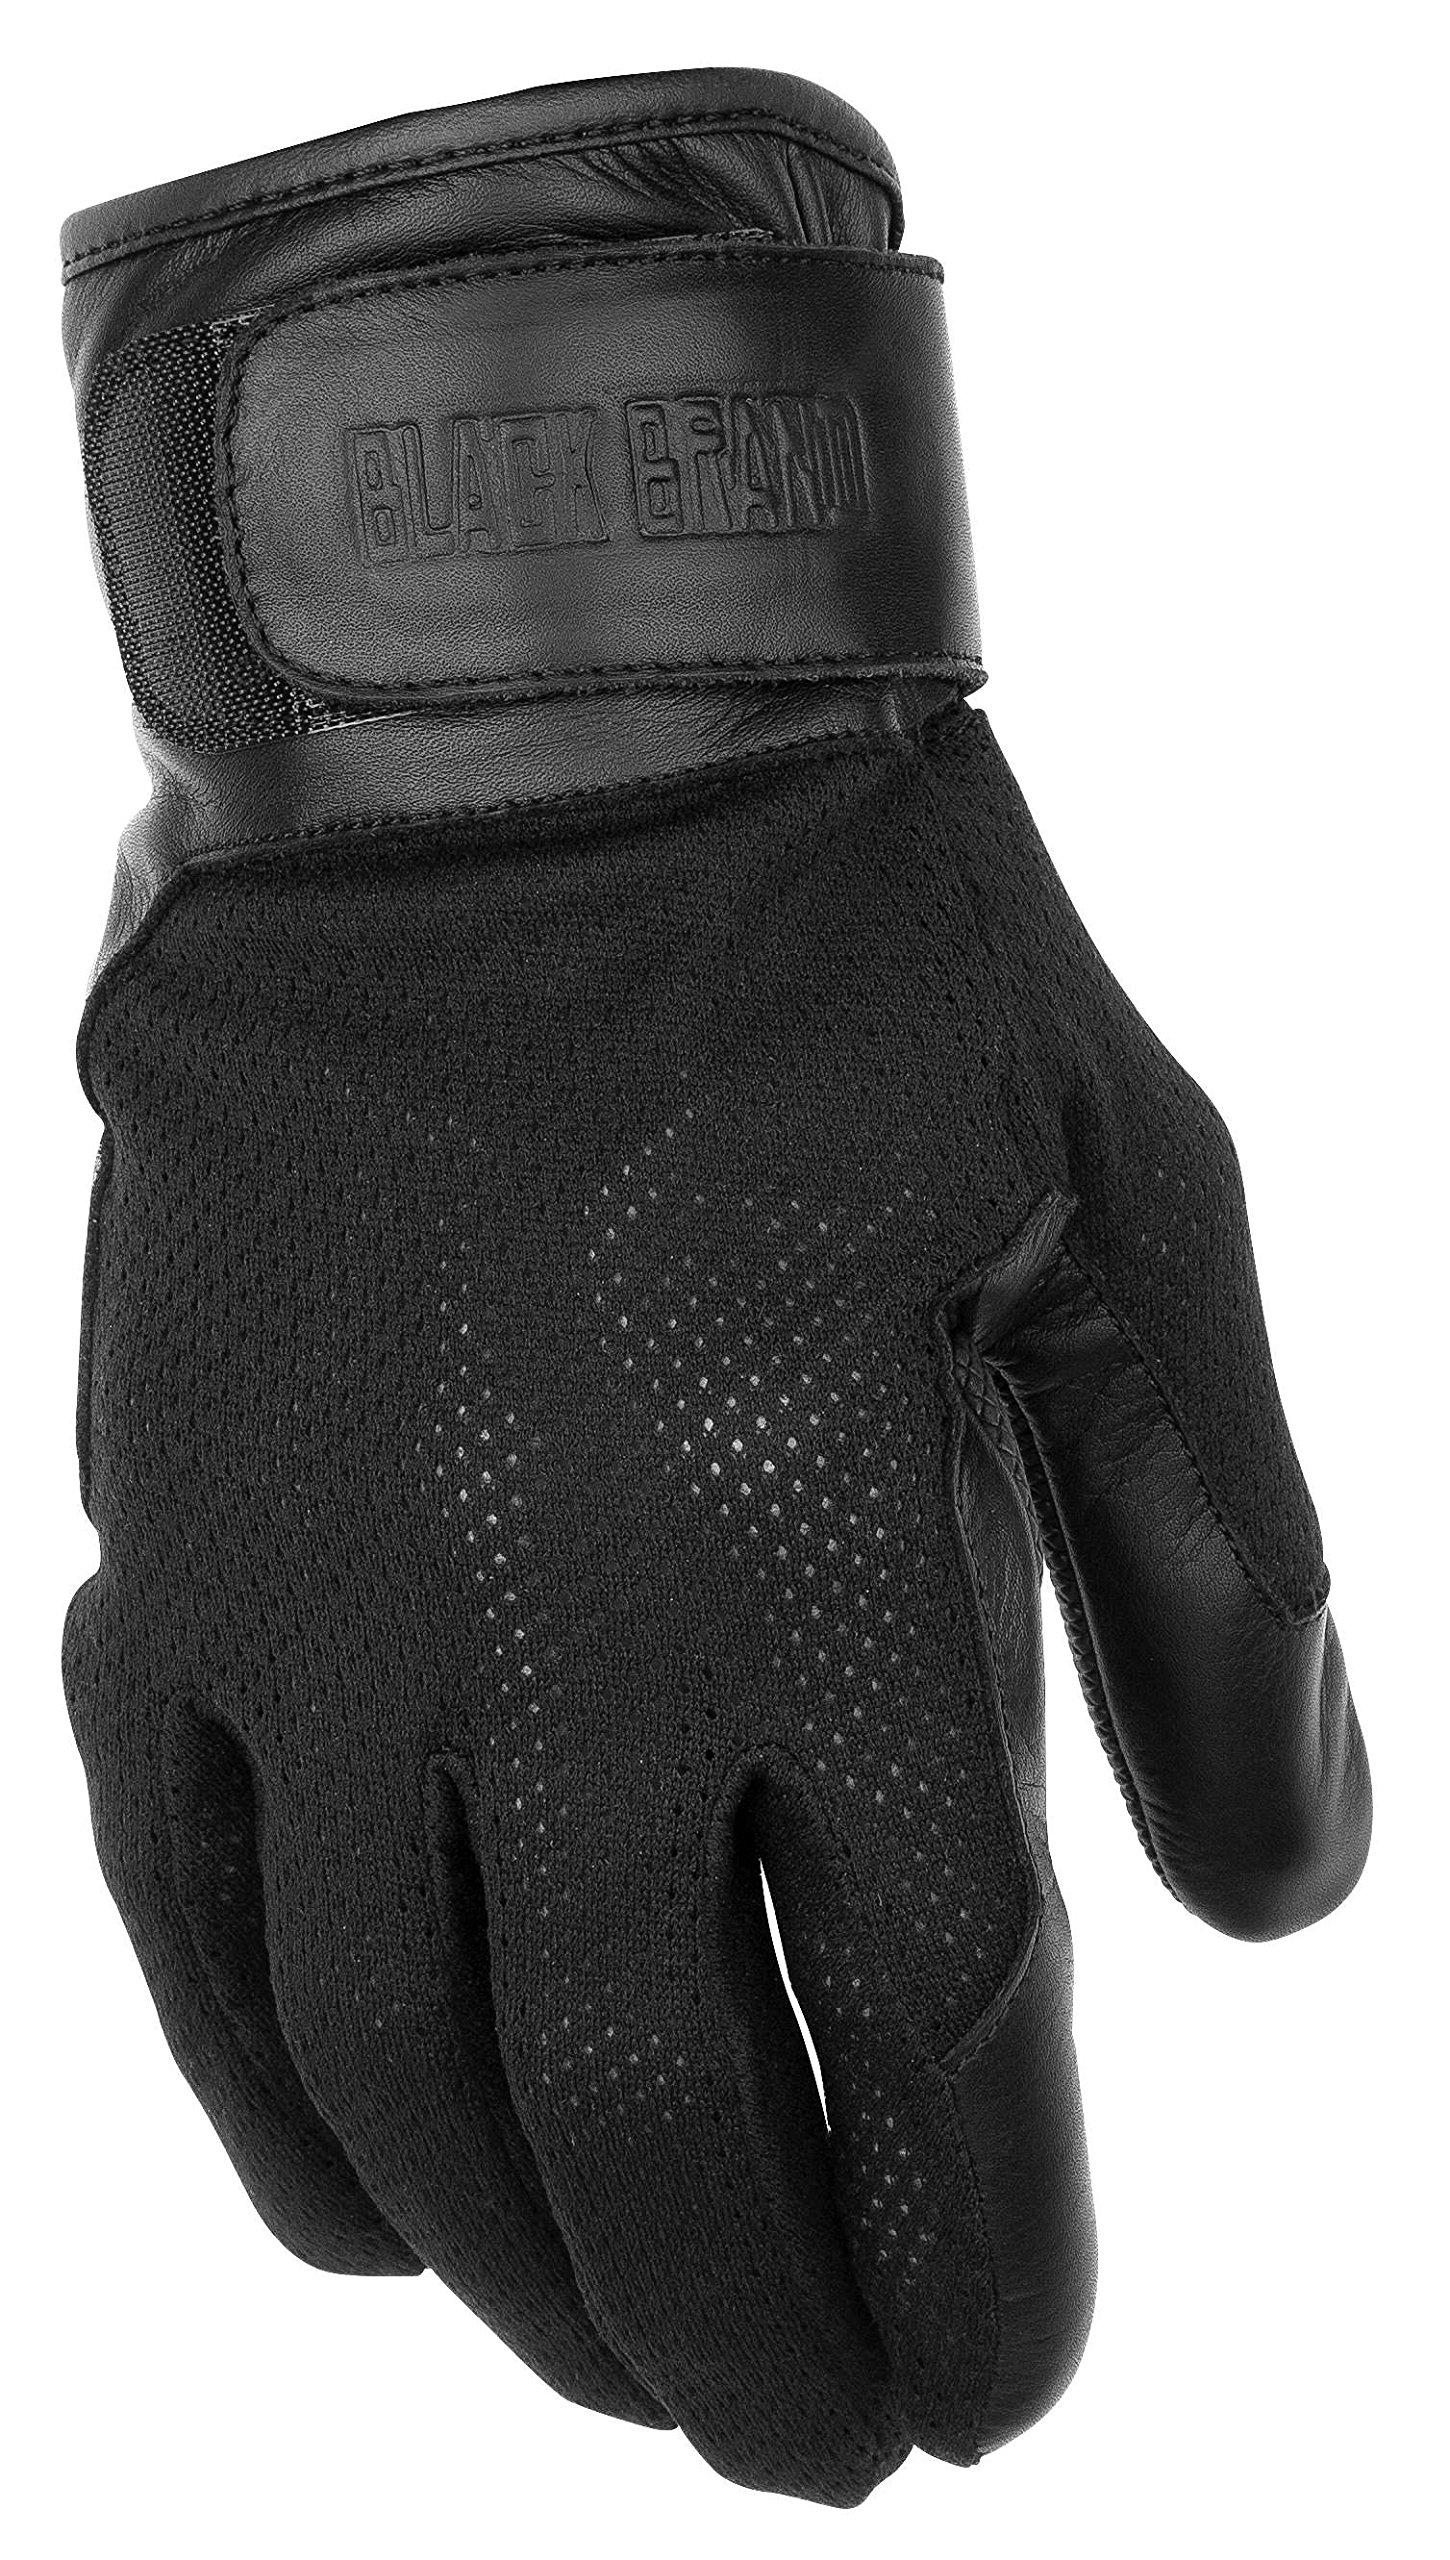 Black Brand Men's Leather/Mesh High Flow Motorcycle Gloves (Black, X-Large)